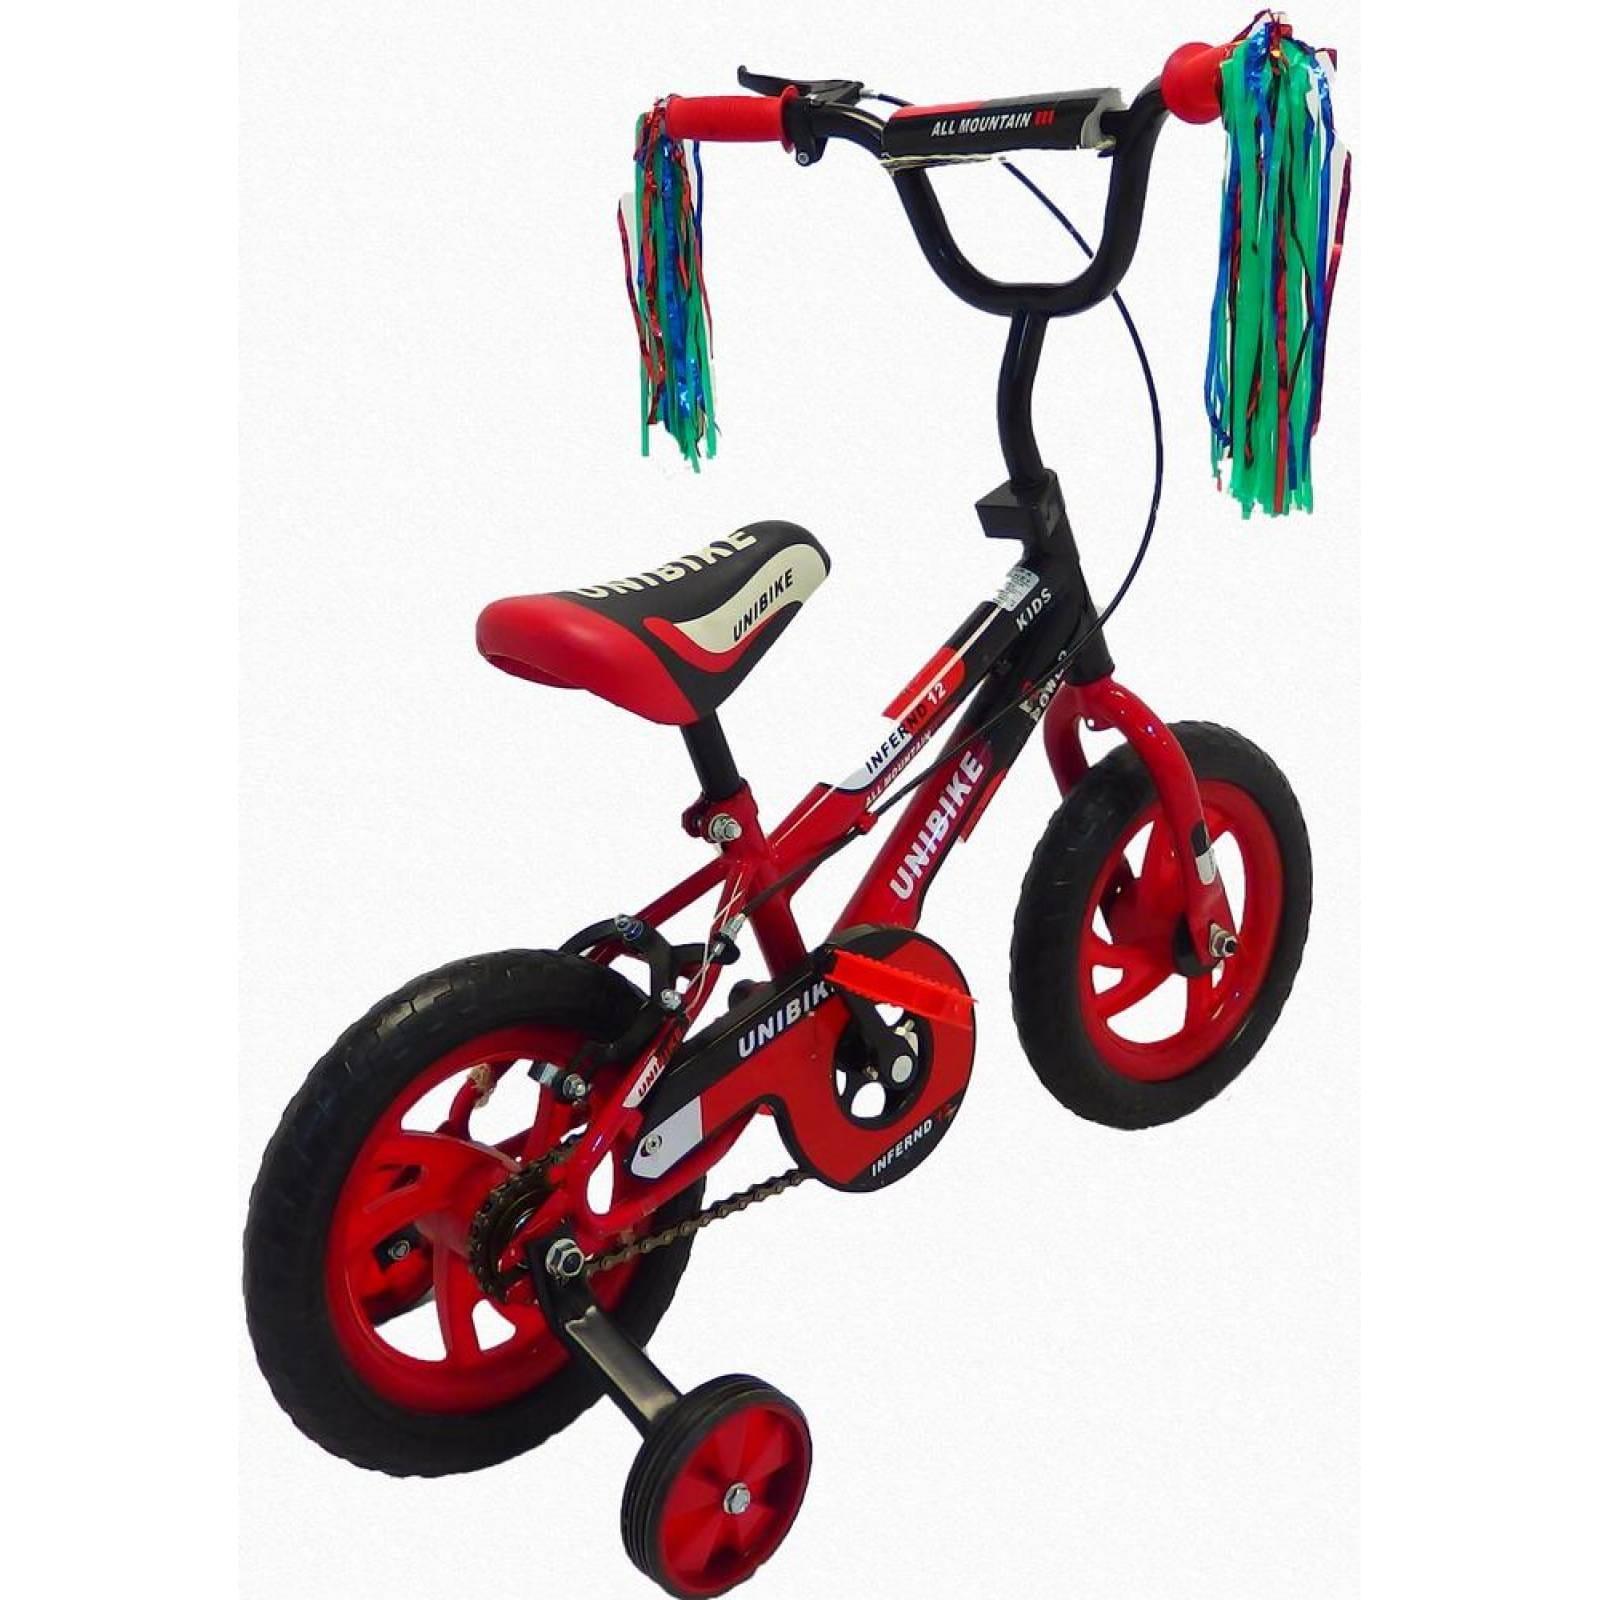 Bicicleta Infantil para niño Rodada 12 con llanta de goma Negro-Rojo